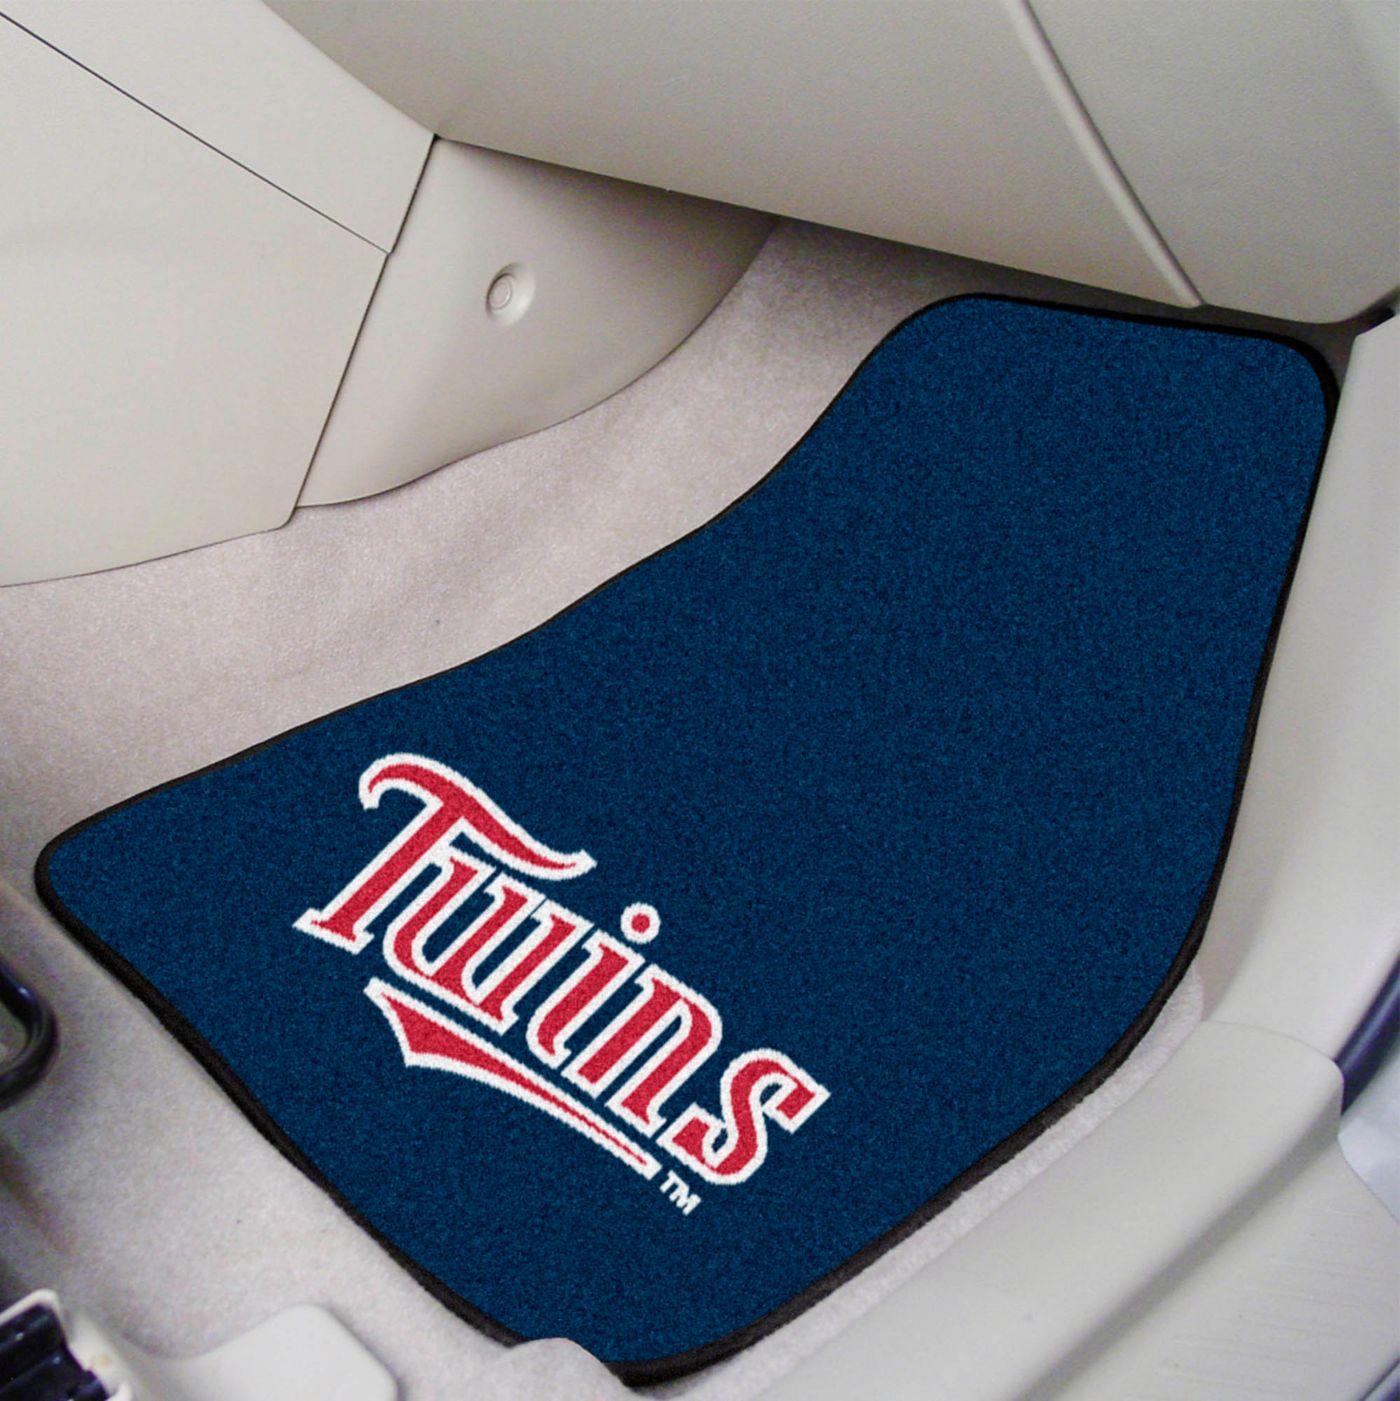 FANMATS Minnesota Twins Printed Car Mats 2-Pack